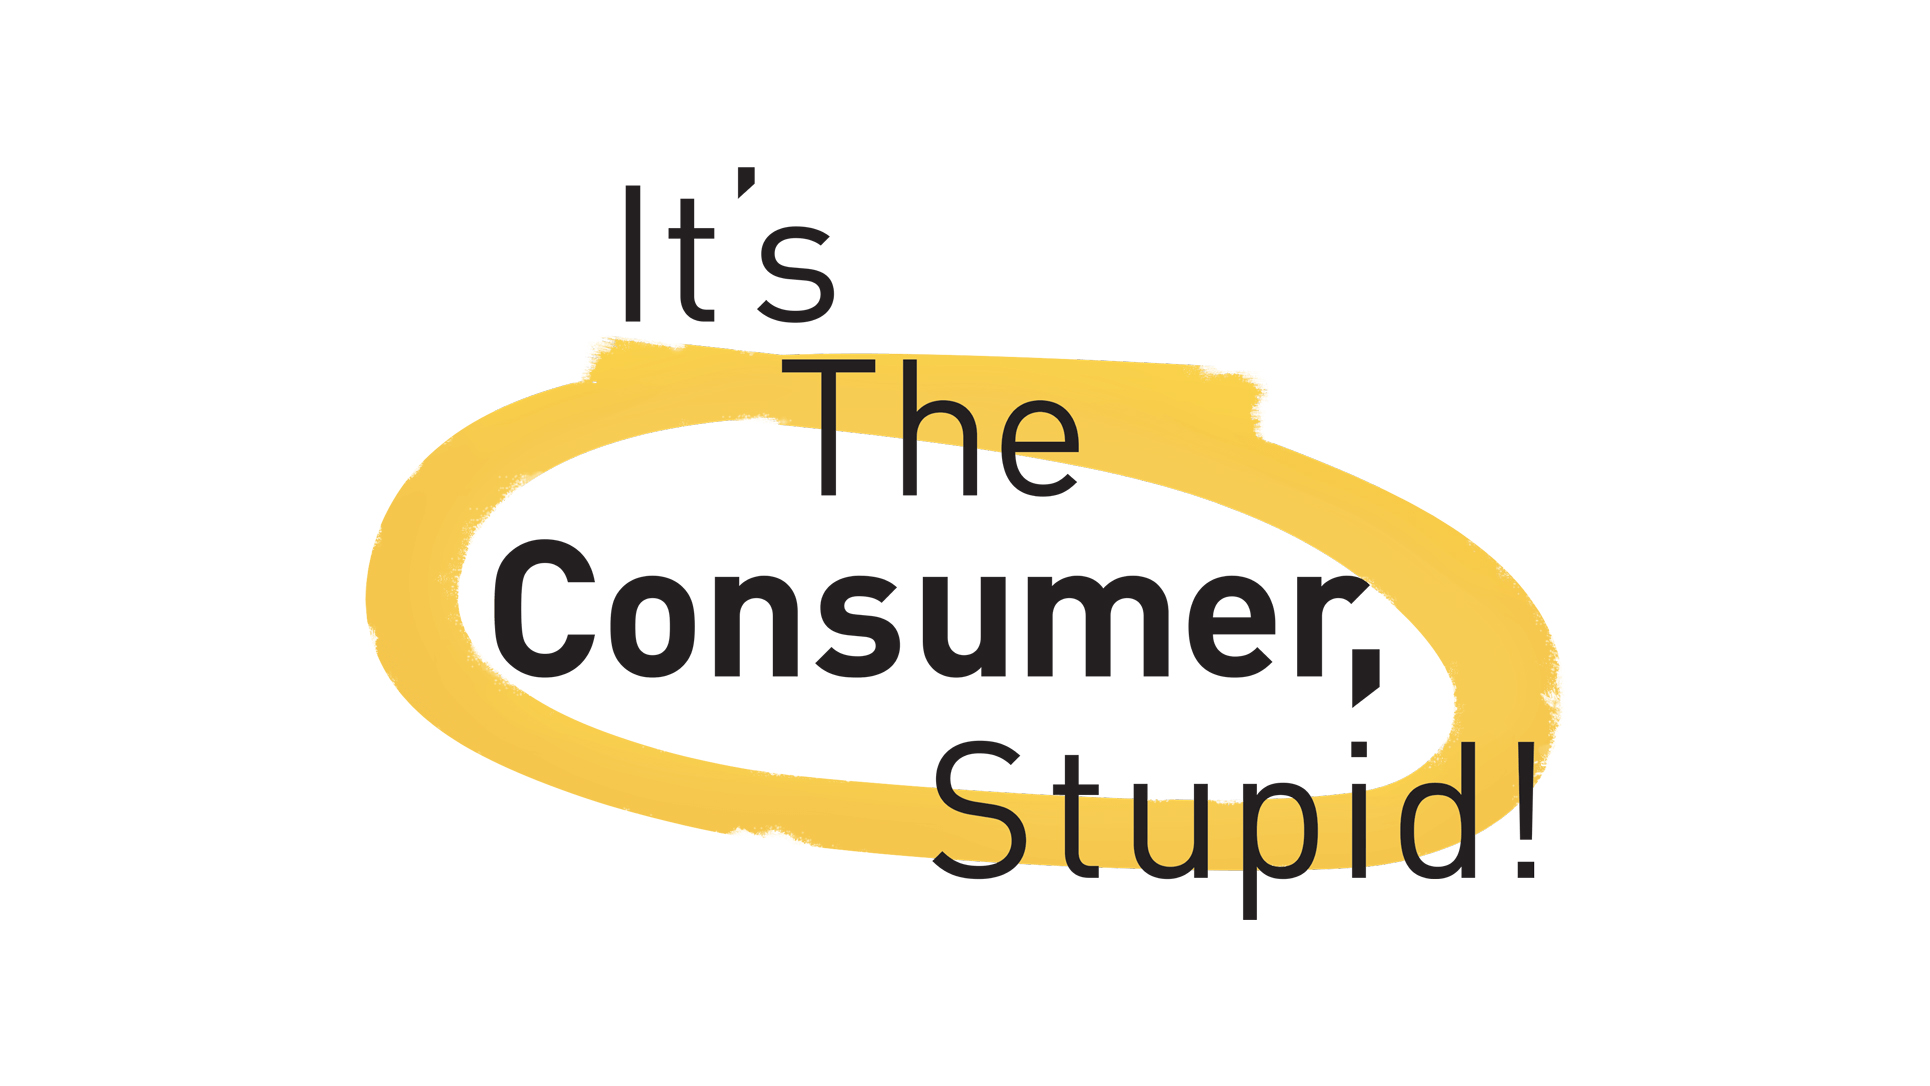 It_s the consumer stupid logo.jpg